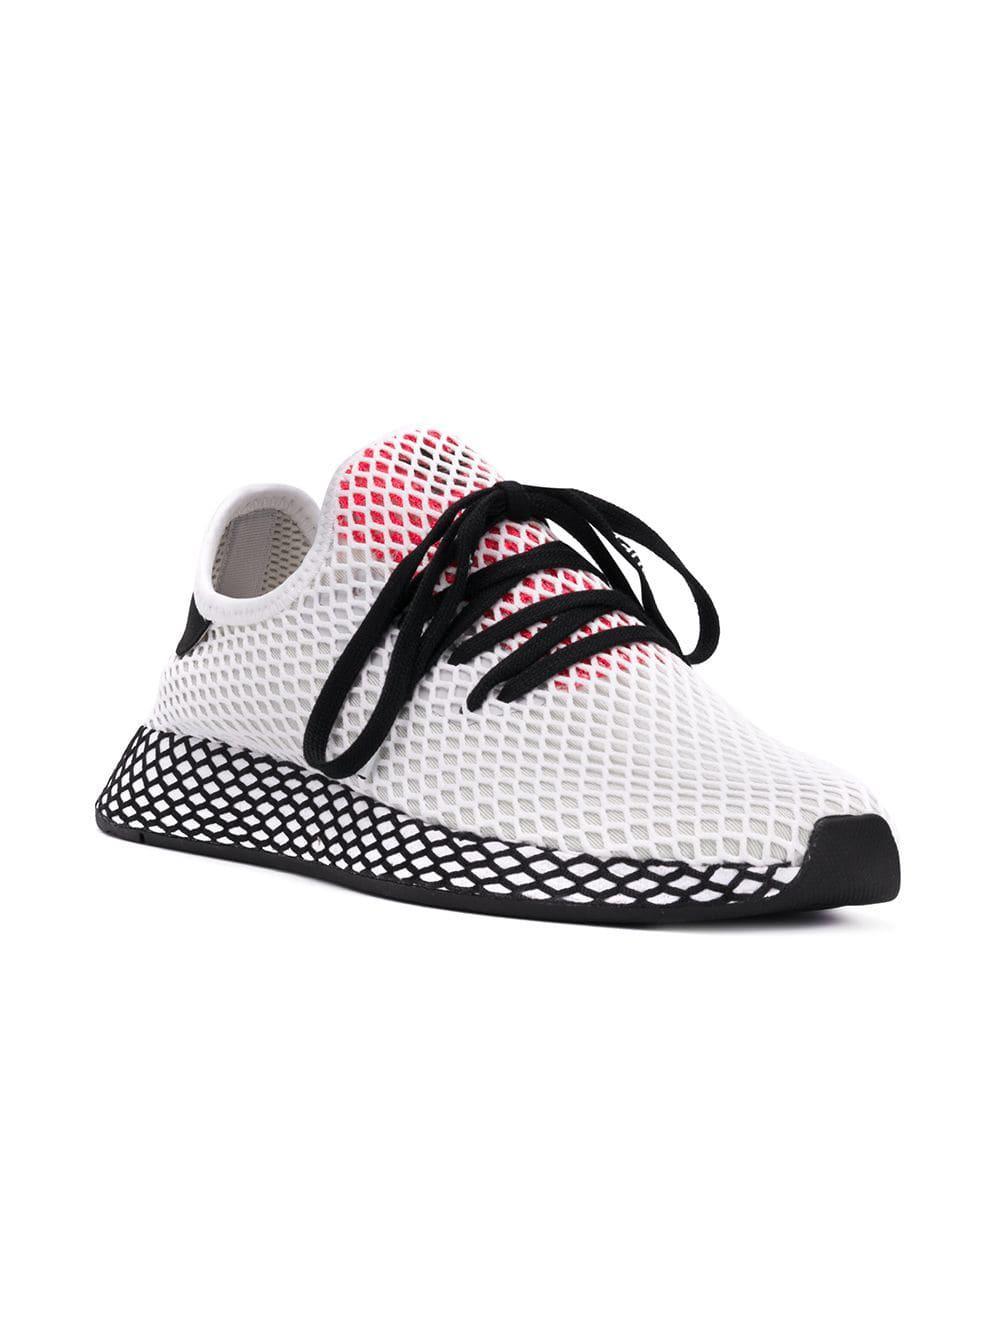 690064ad870ea Lyst - adidas Deerupt Runner Sneakers in White for Men